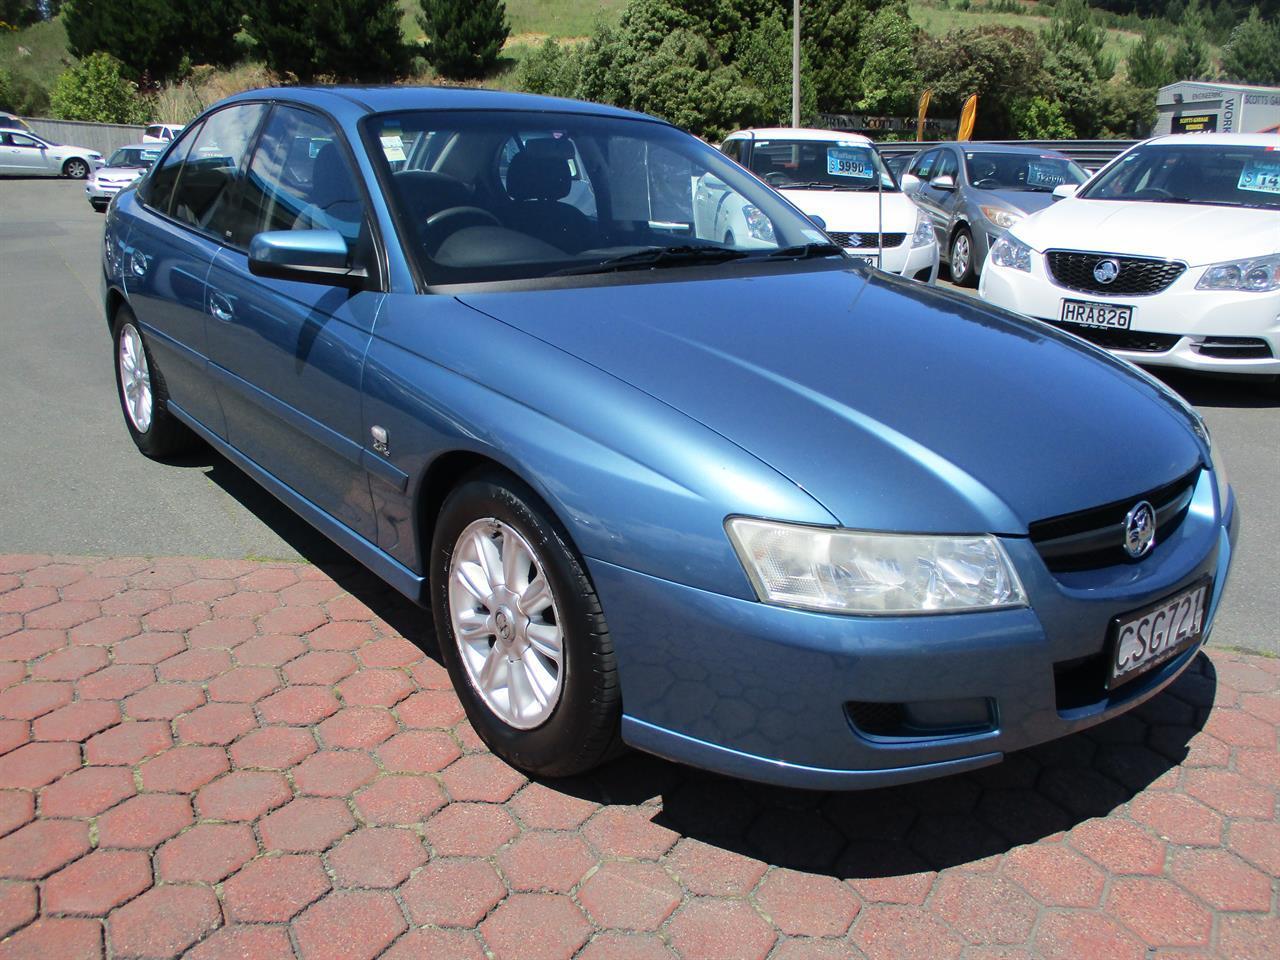 image-1, 2005 Holden Commodore VZ Acclaim at Dunedin